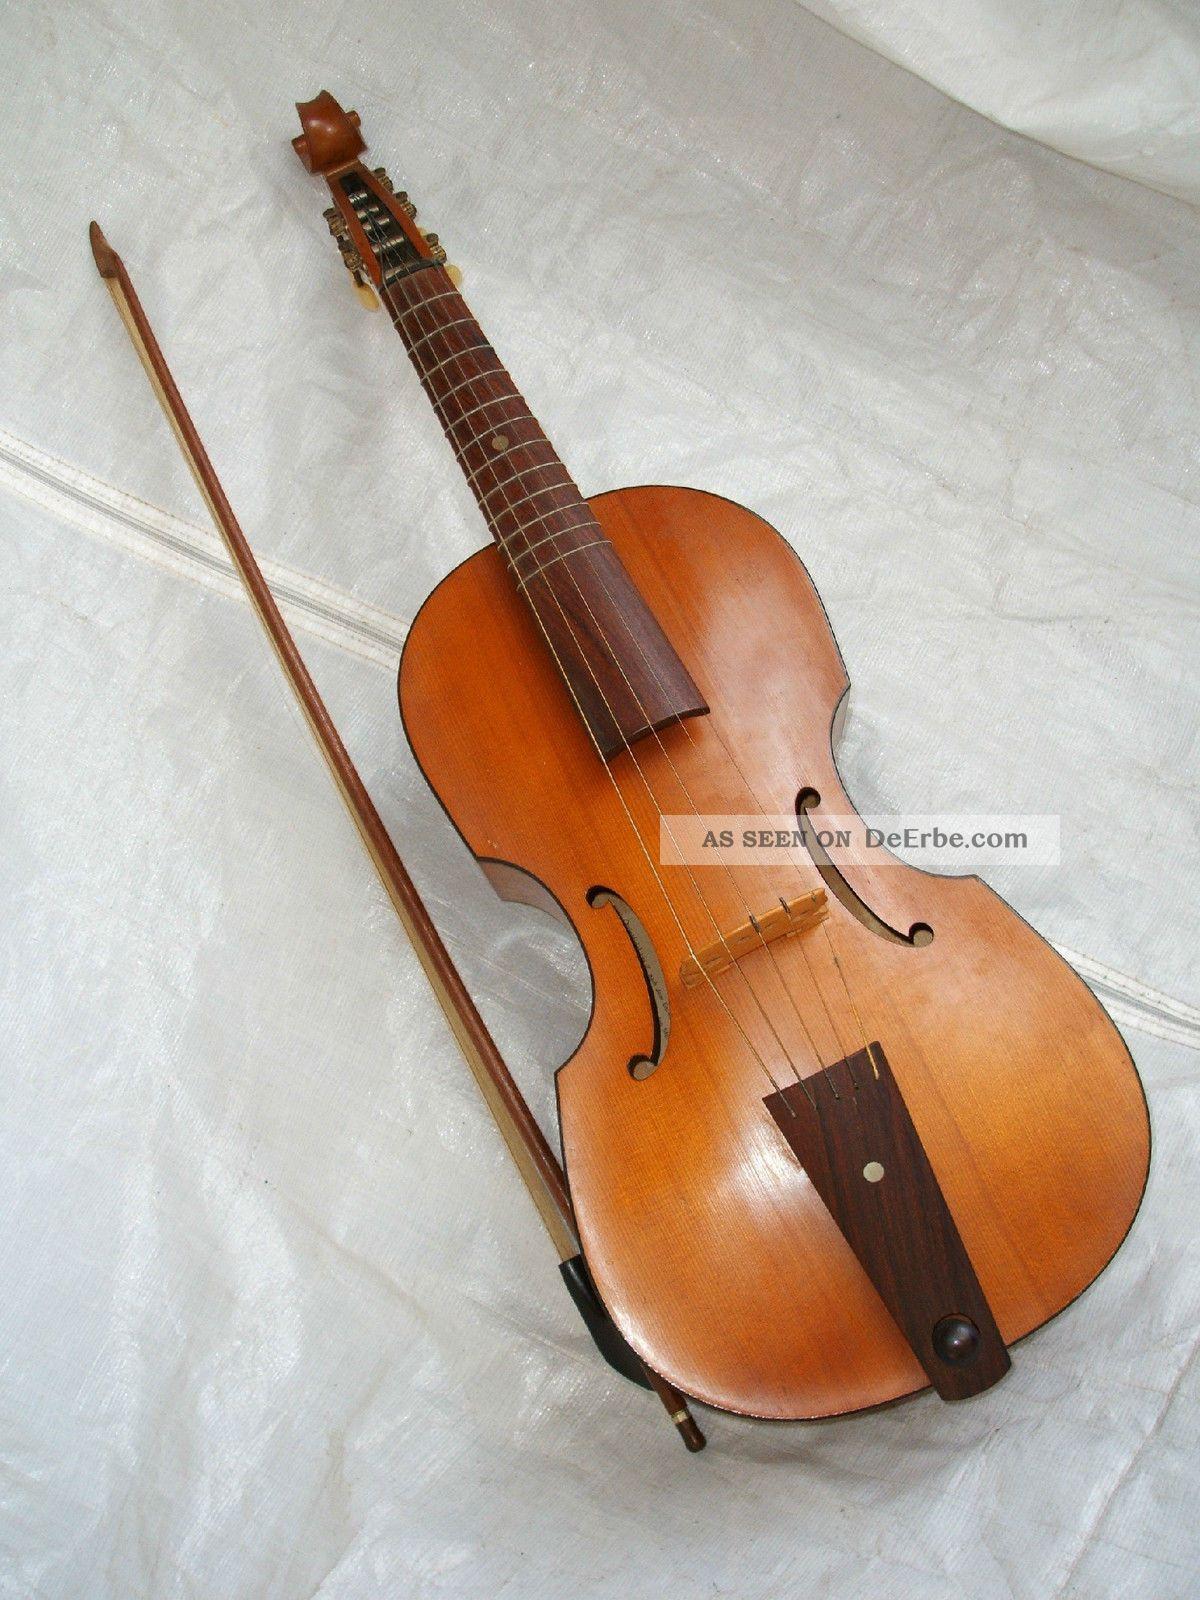 1967 Viola Da Gamba Diskant Gambe Quintfidel Fidel Von Moeck Consort Baroque Musikinstrumente Bild